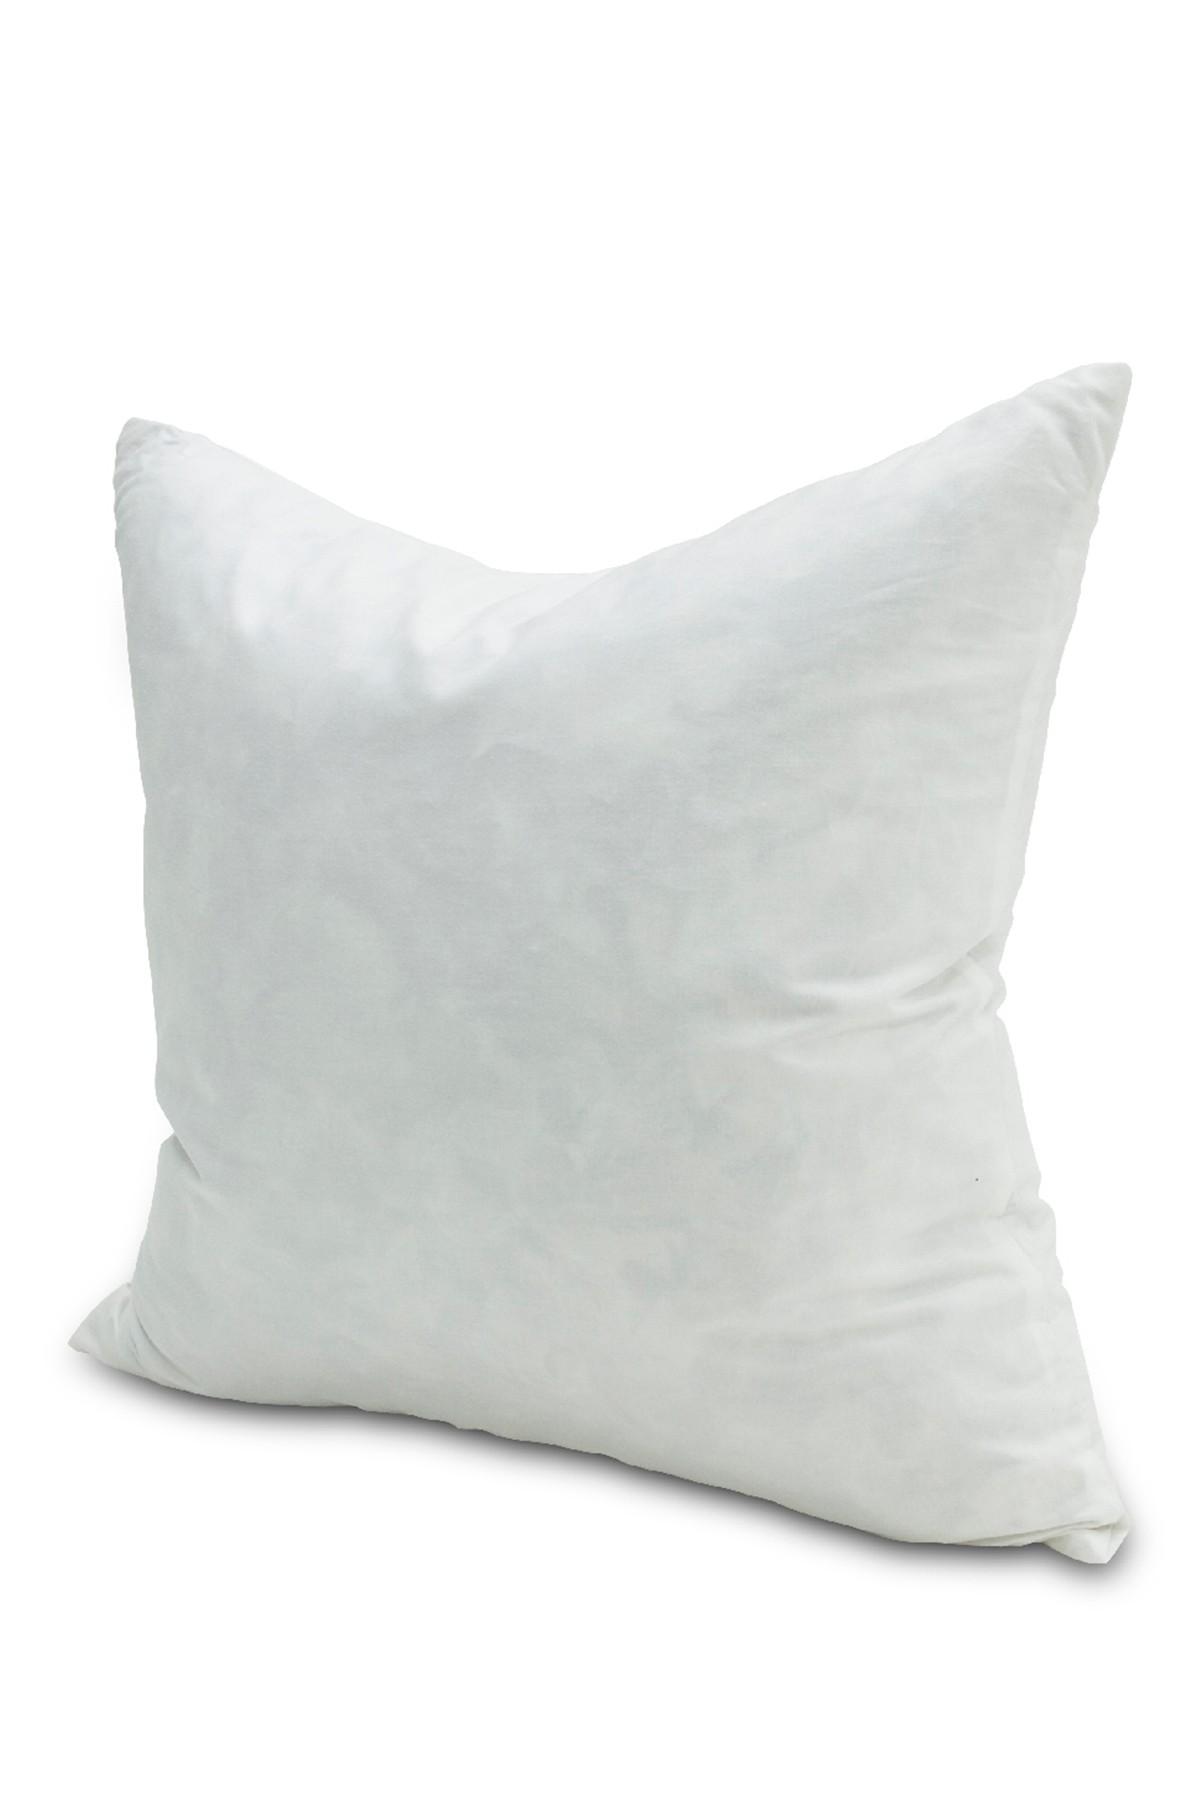 Rio Home Tuscan Villa Boudoir Down Feather Decorative Pillow Insert 12 X16 Decorative Pillows Pillows Pillow Inserts